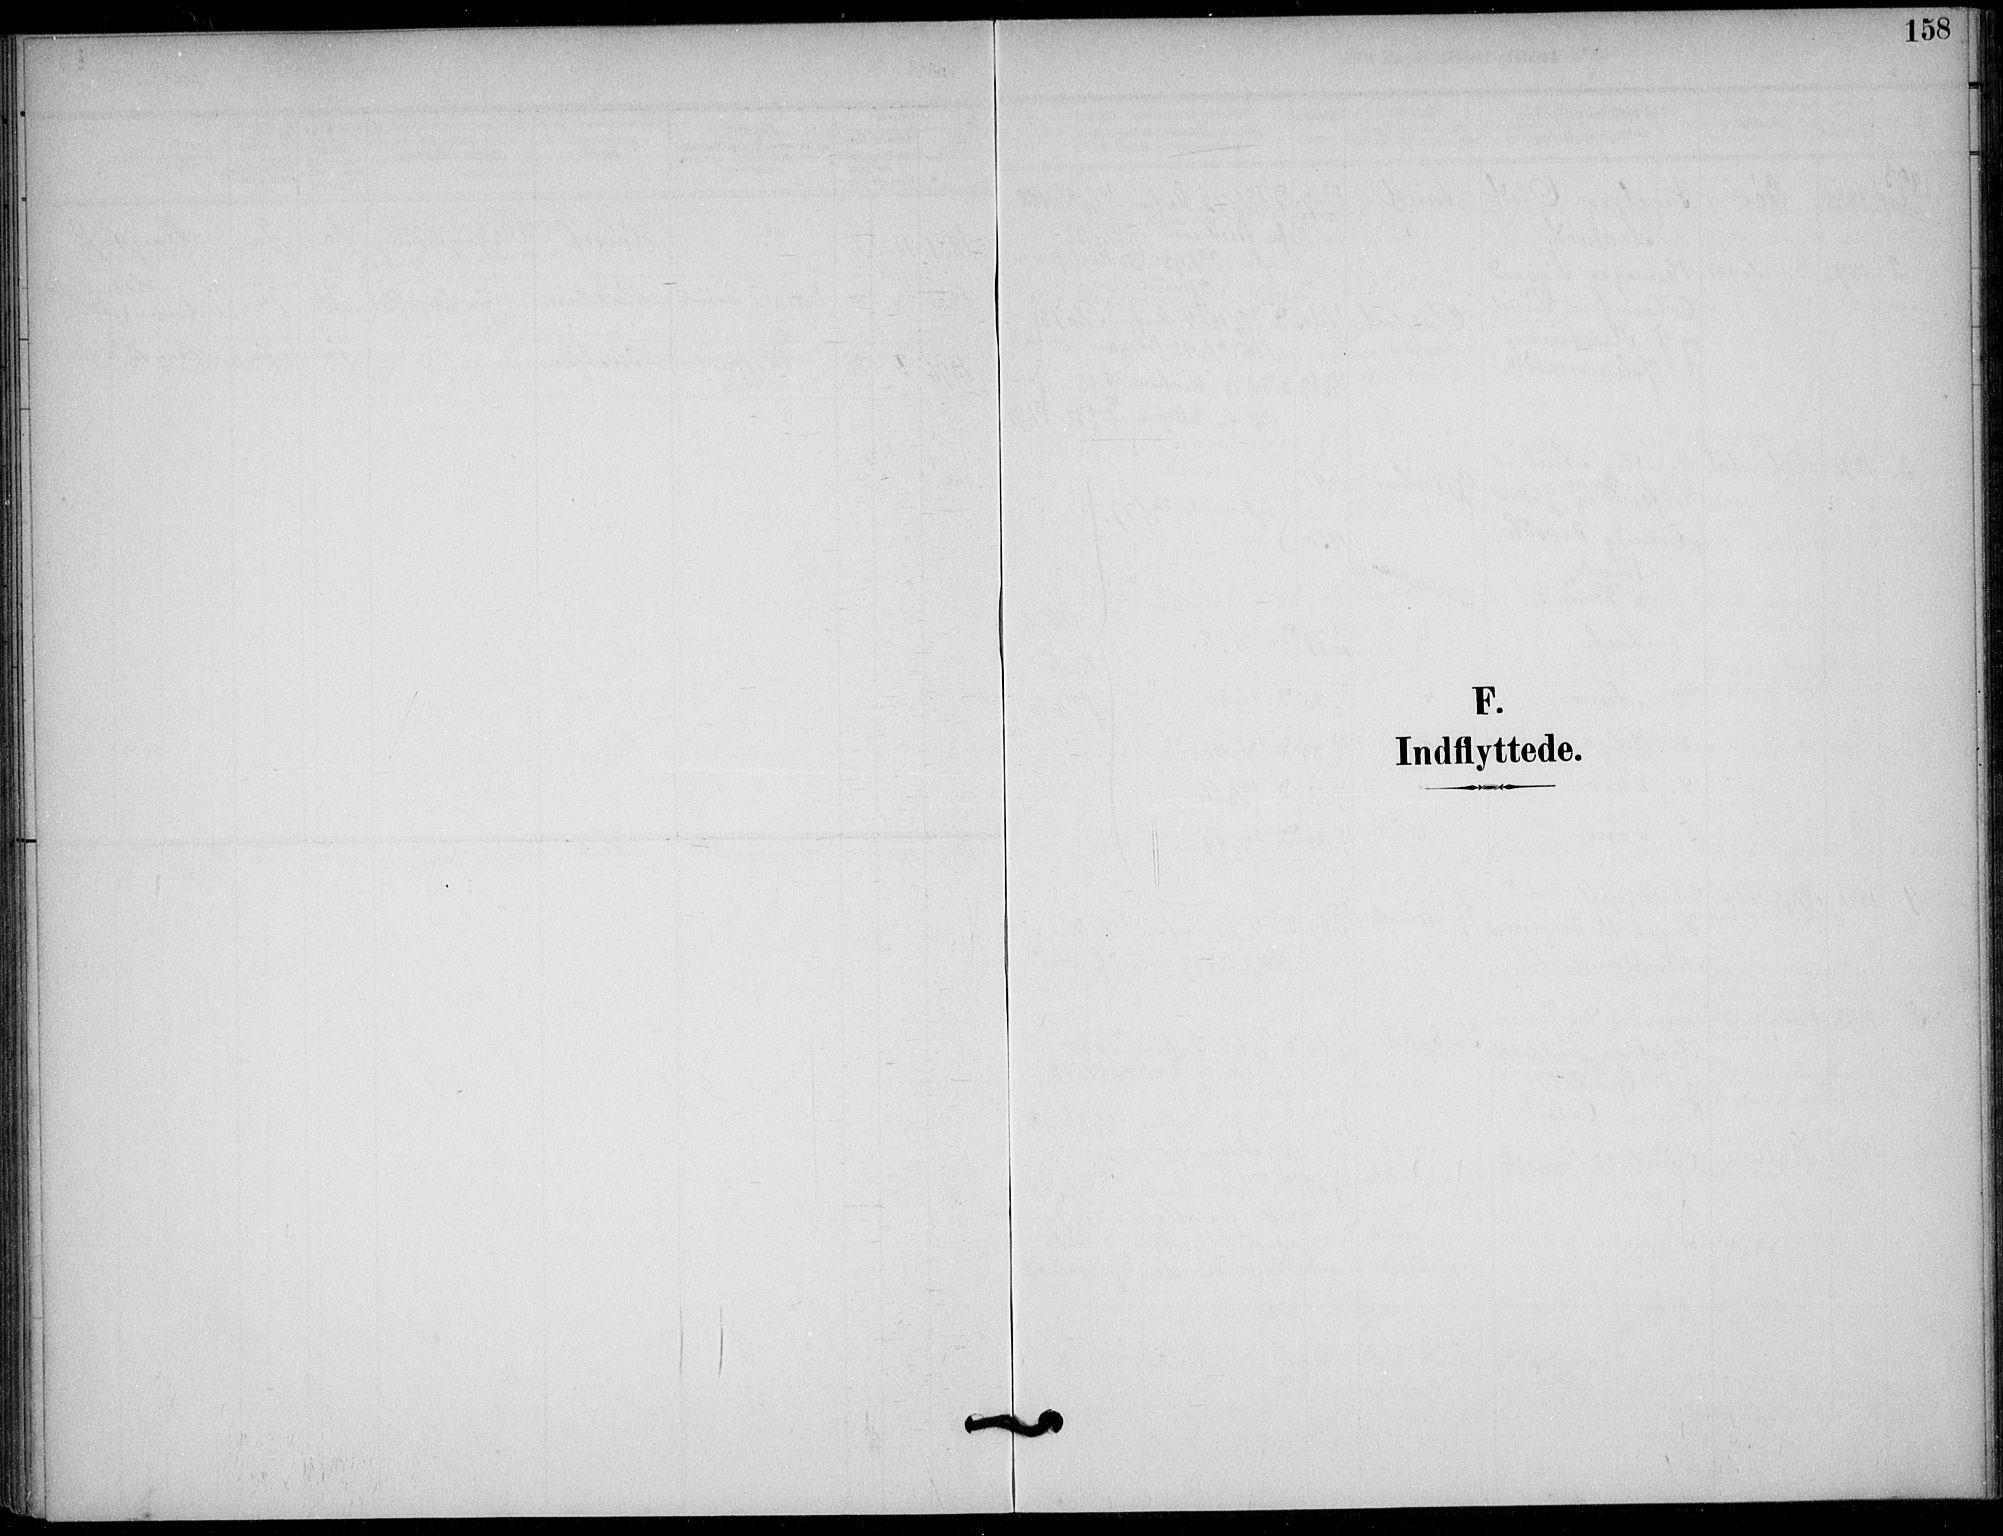 SAKO, Solum kirkebøker, F/Fb/L0002: Ministerialbok nr. II 2, 1893-1901, s. 158